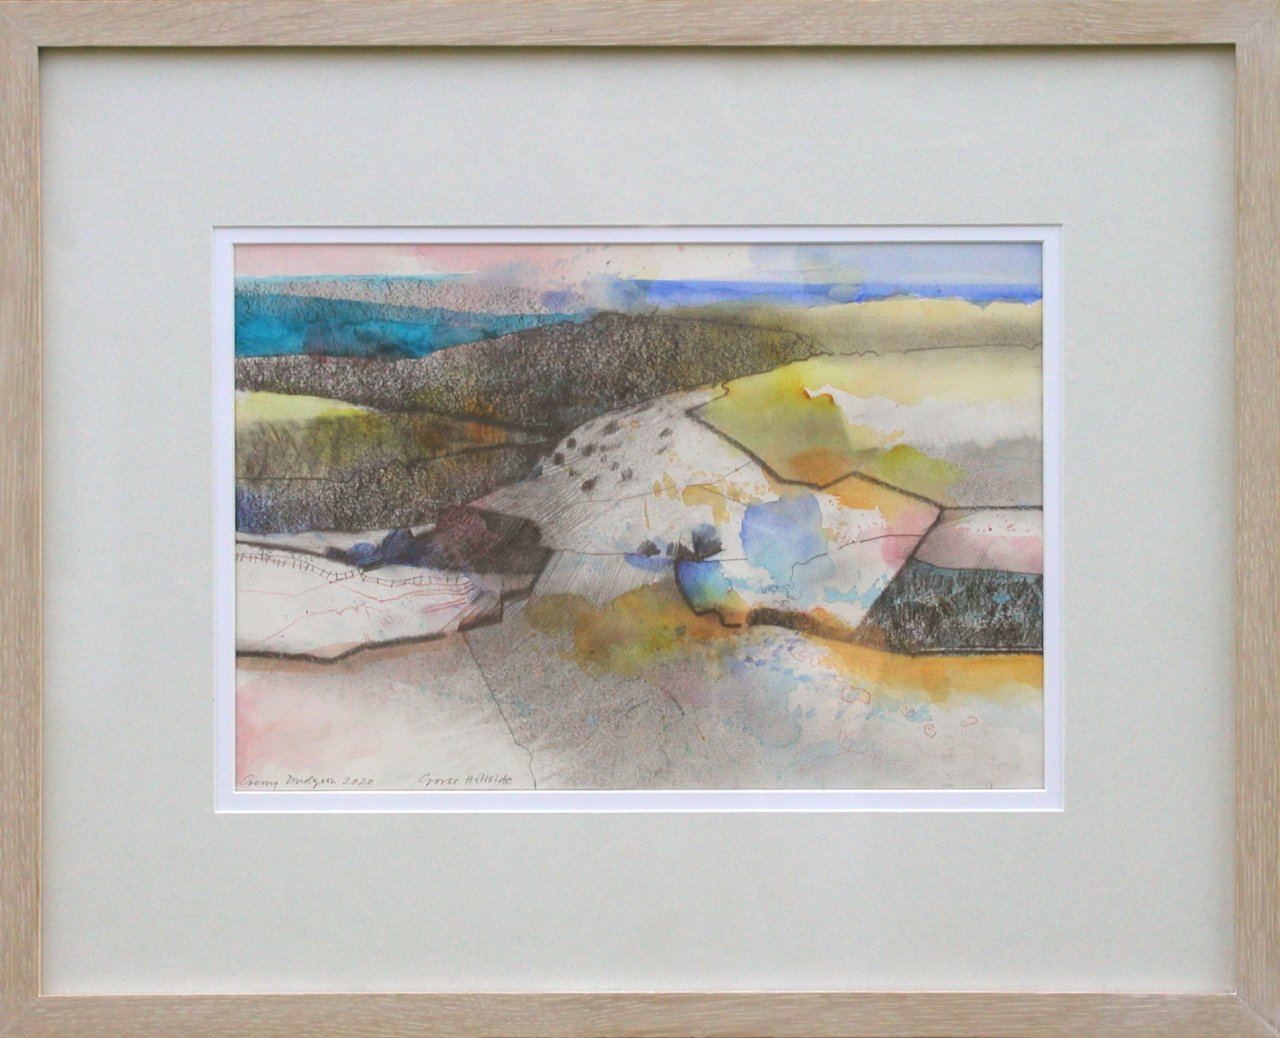 Gerry Dudgeon Gorse Hillside (framed)